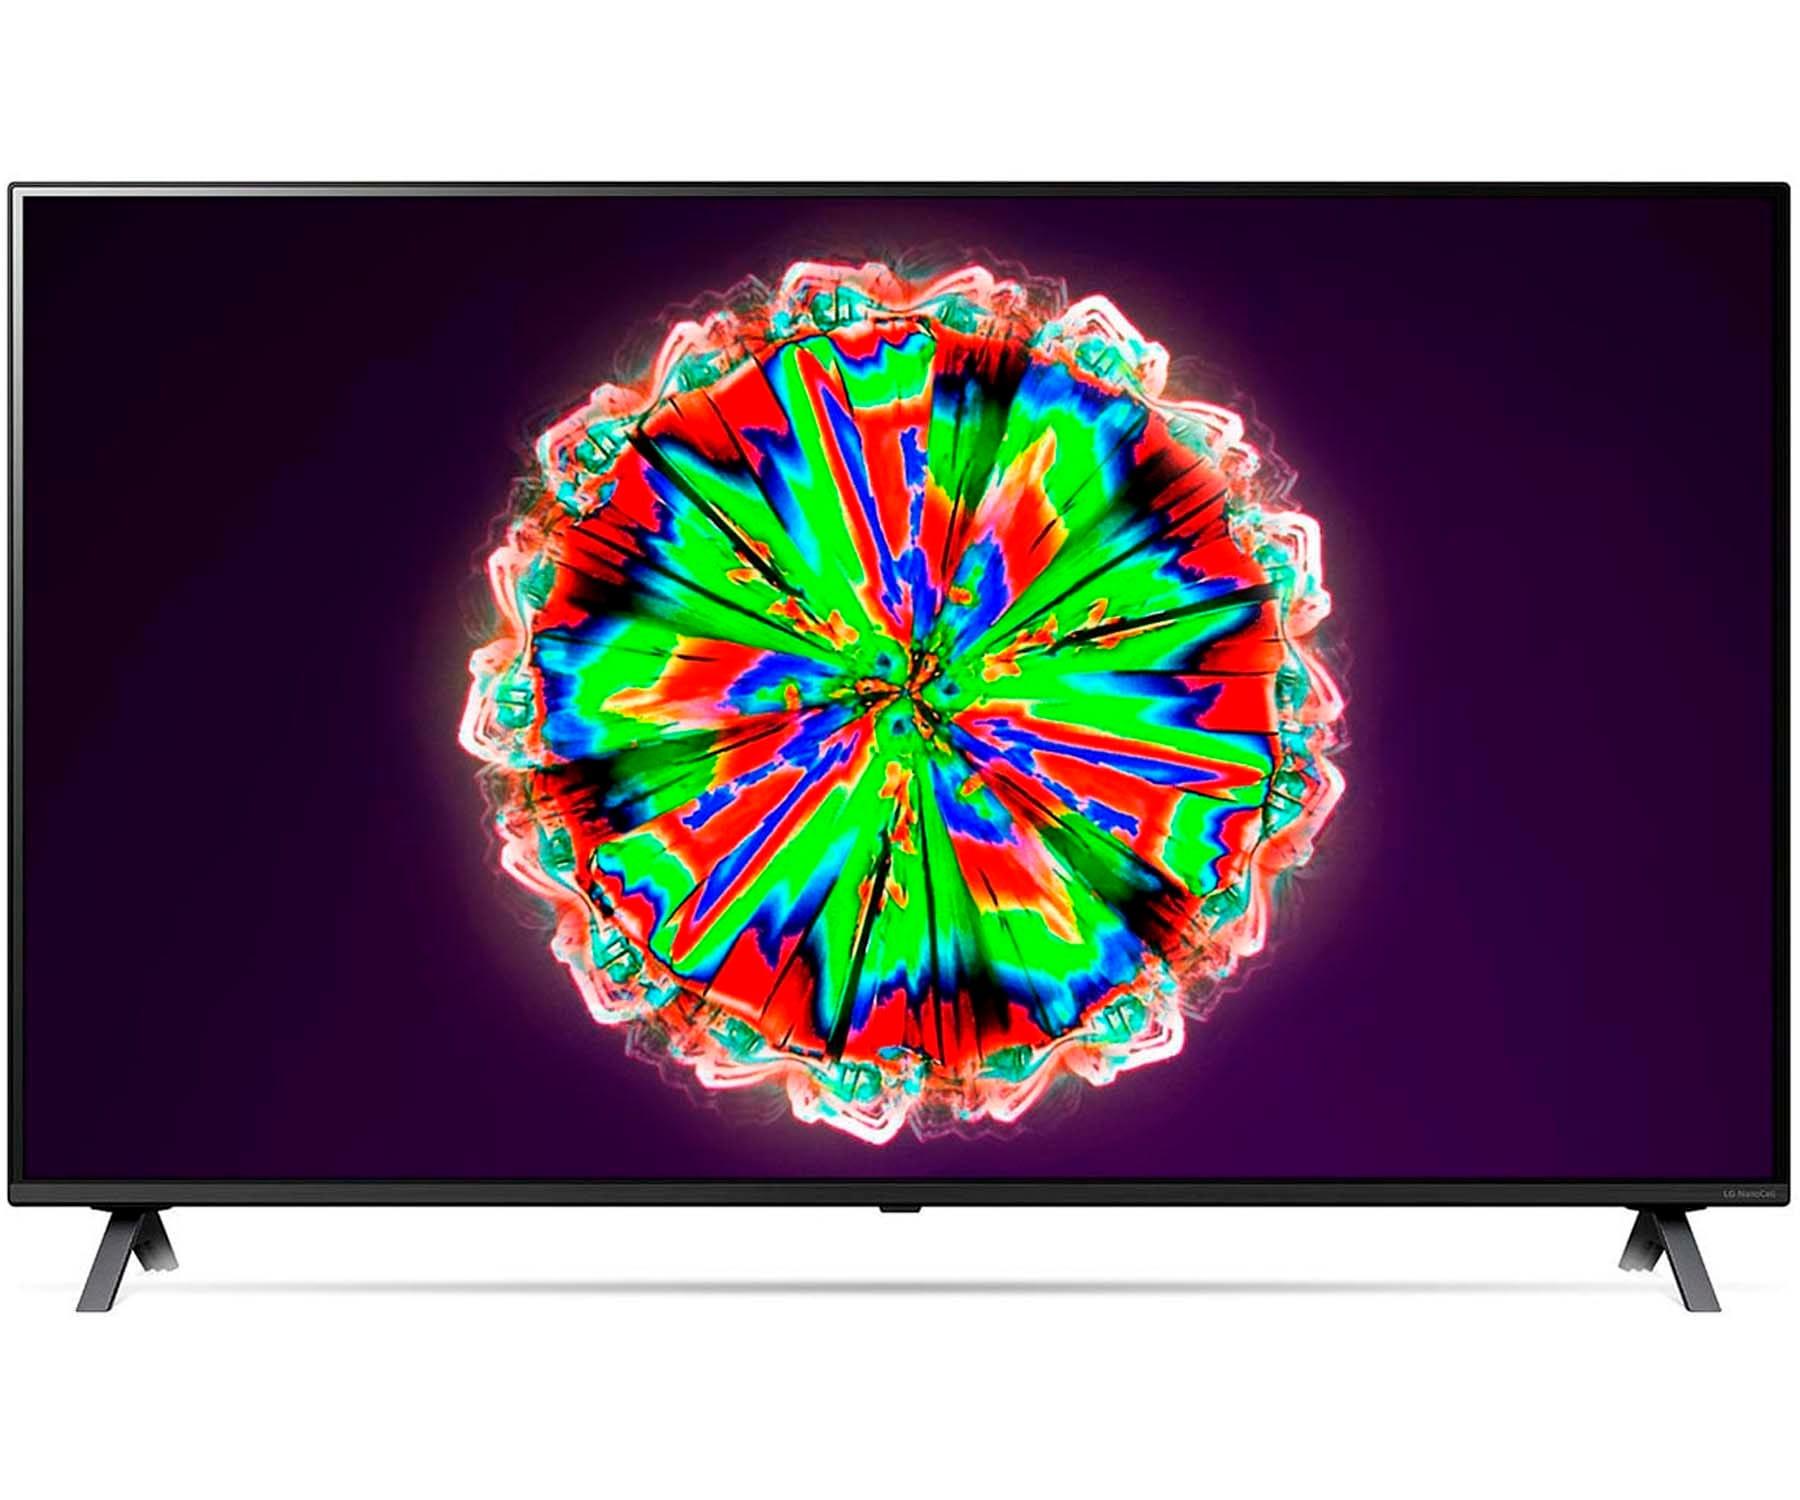 LG 55NANO806NA TELEVISOR 55'' NANOCELL UHD IPS 4K HDR SMART TV CON IA WIFI BLUETOOTH